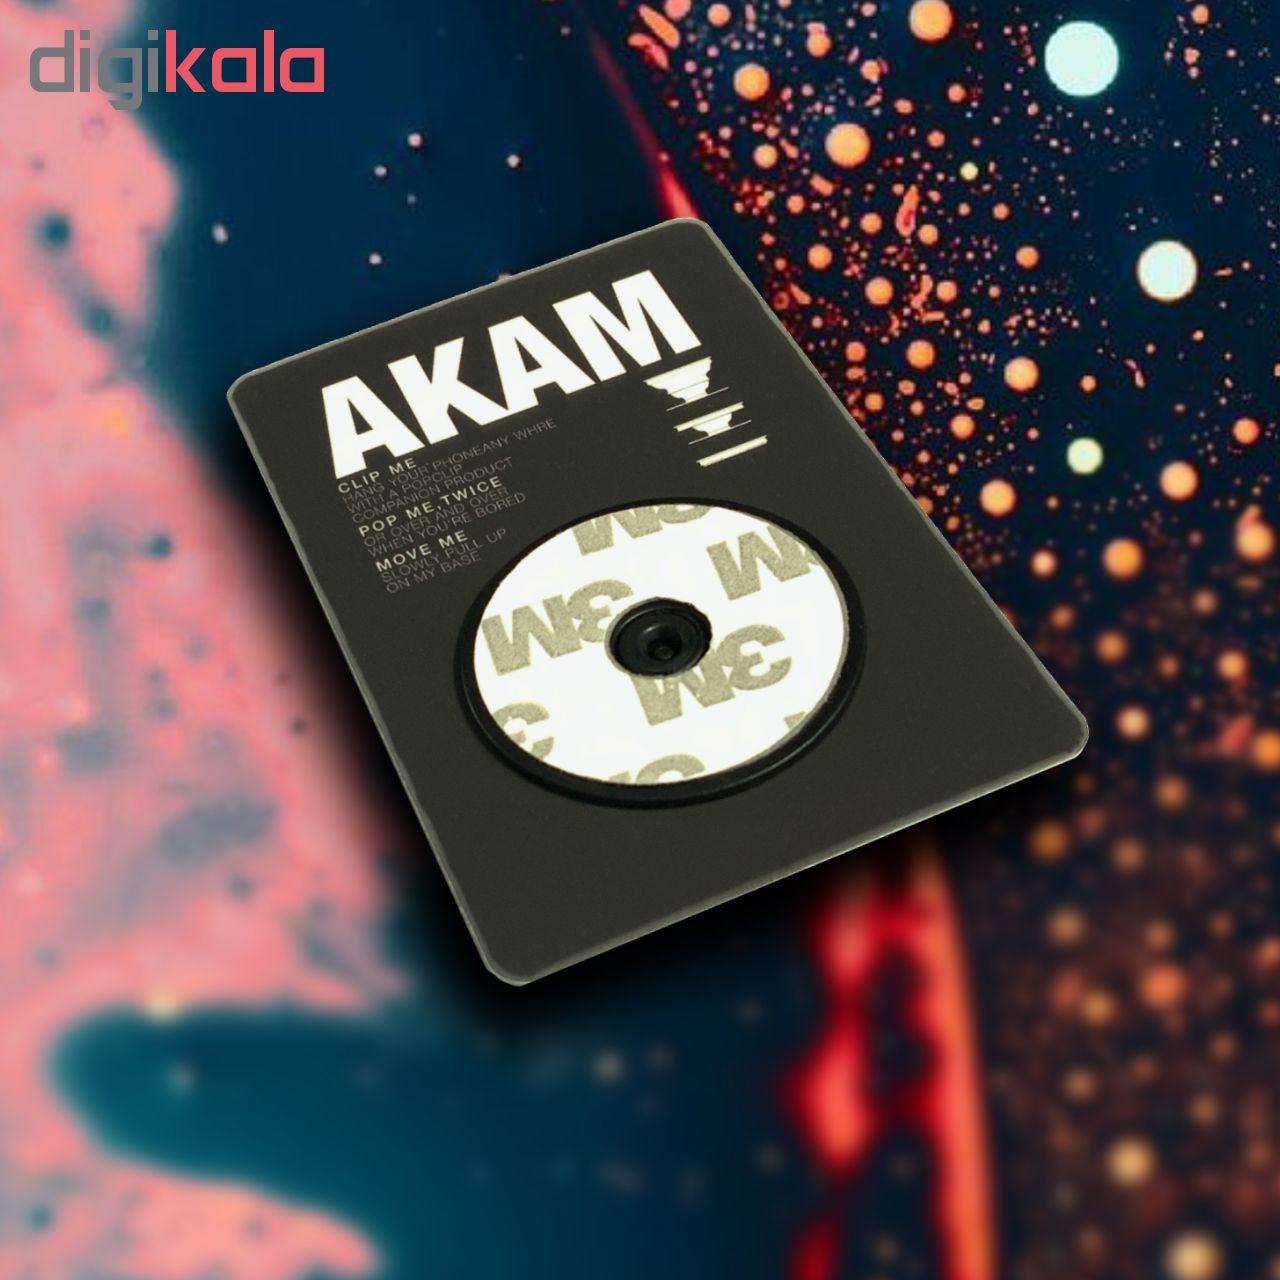 پایه نگهدارنده گوشی موبایل پاپ سوکت آکام مدل APS0161 main 1 2